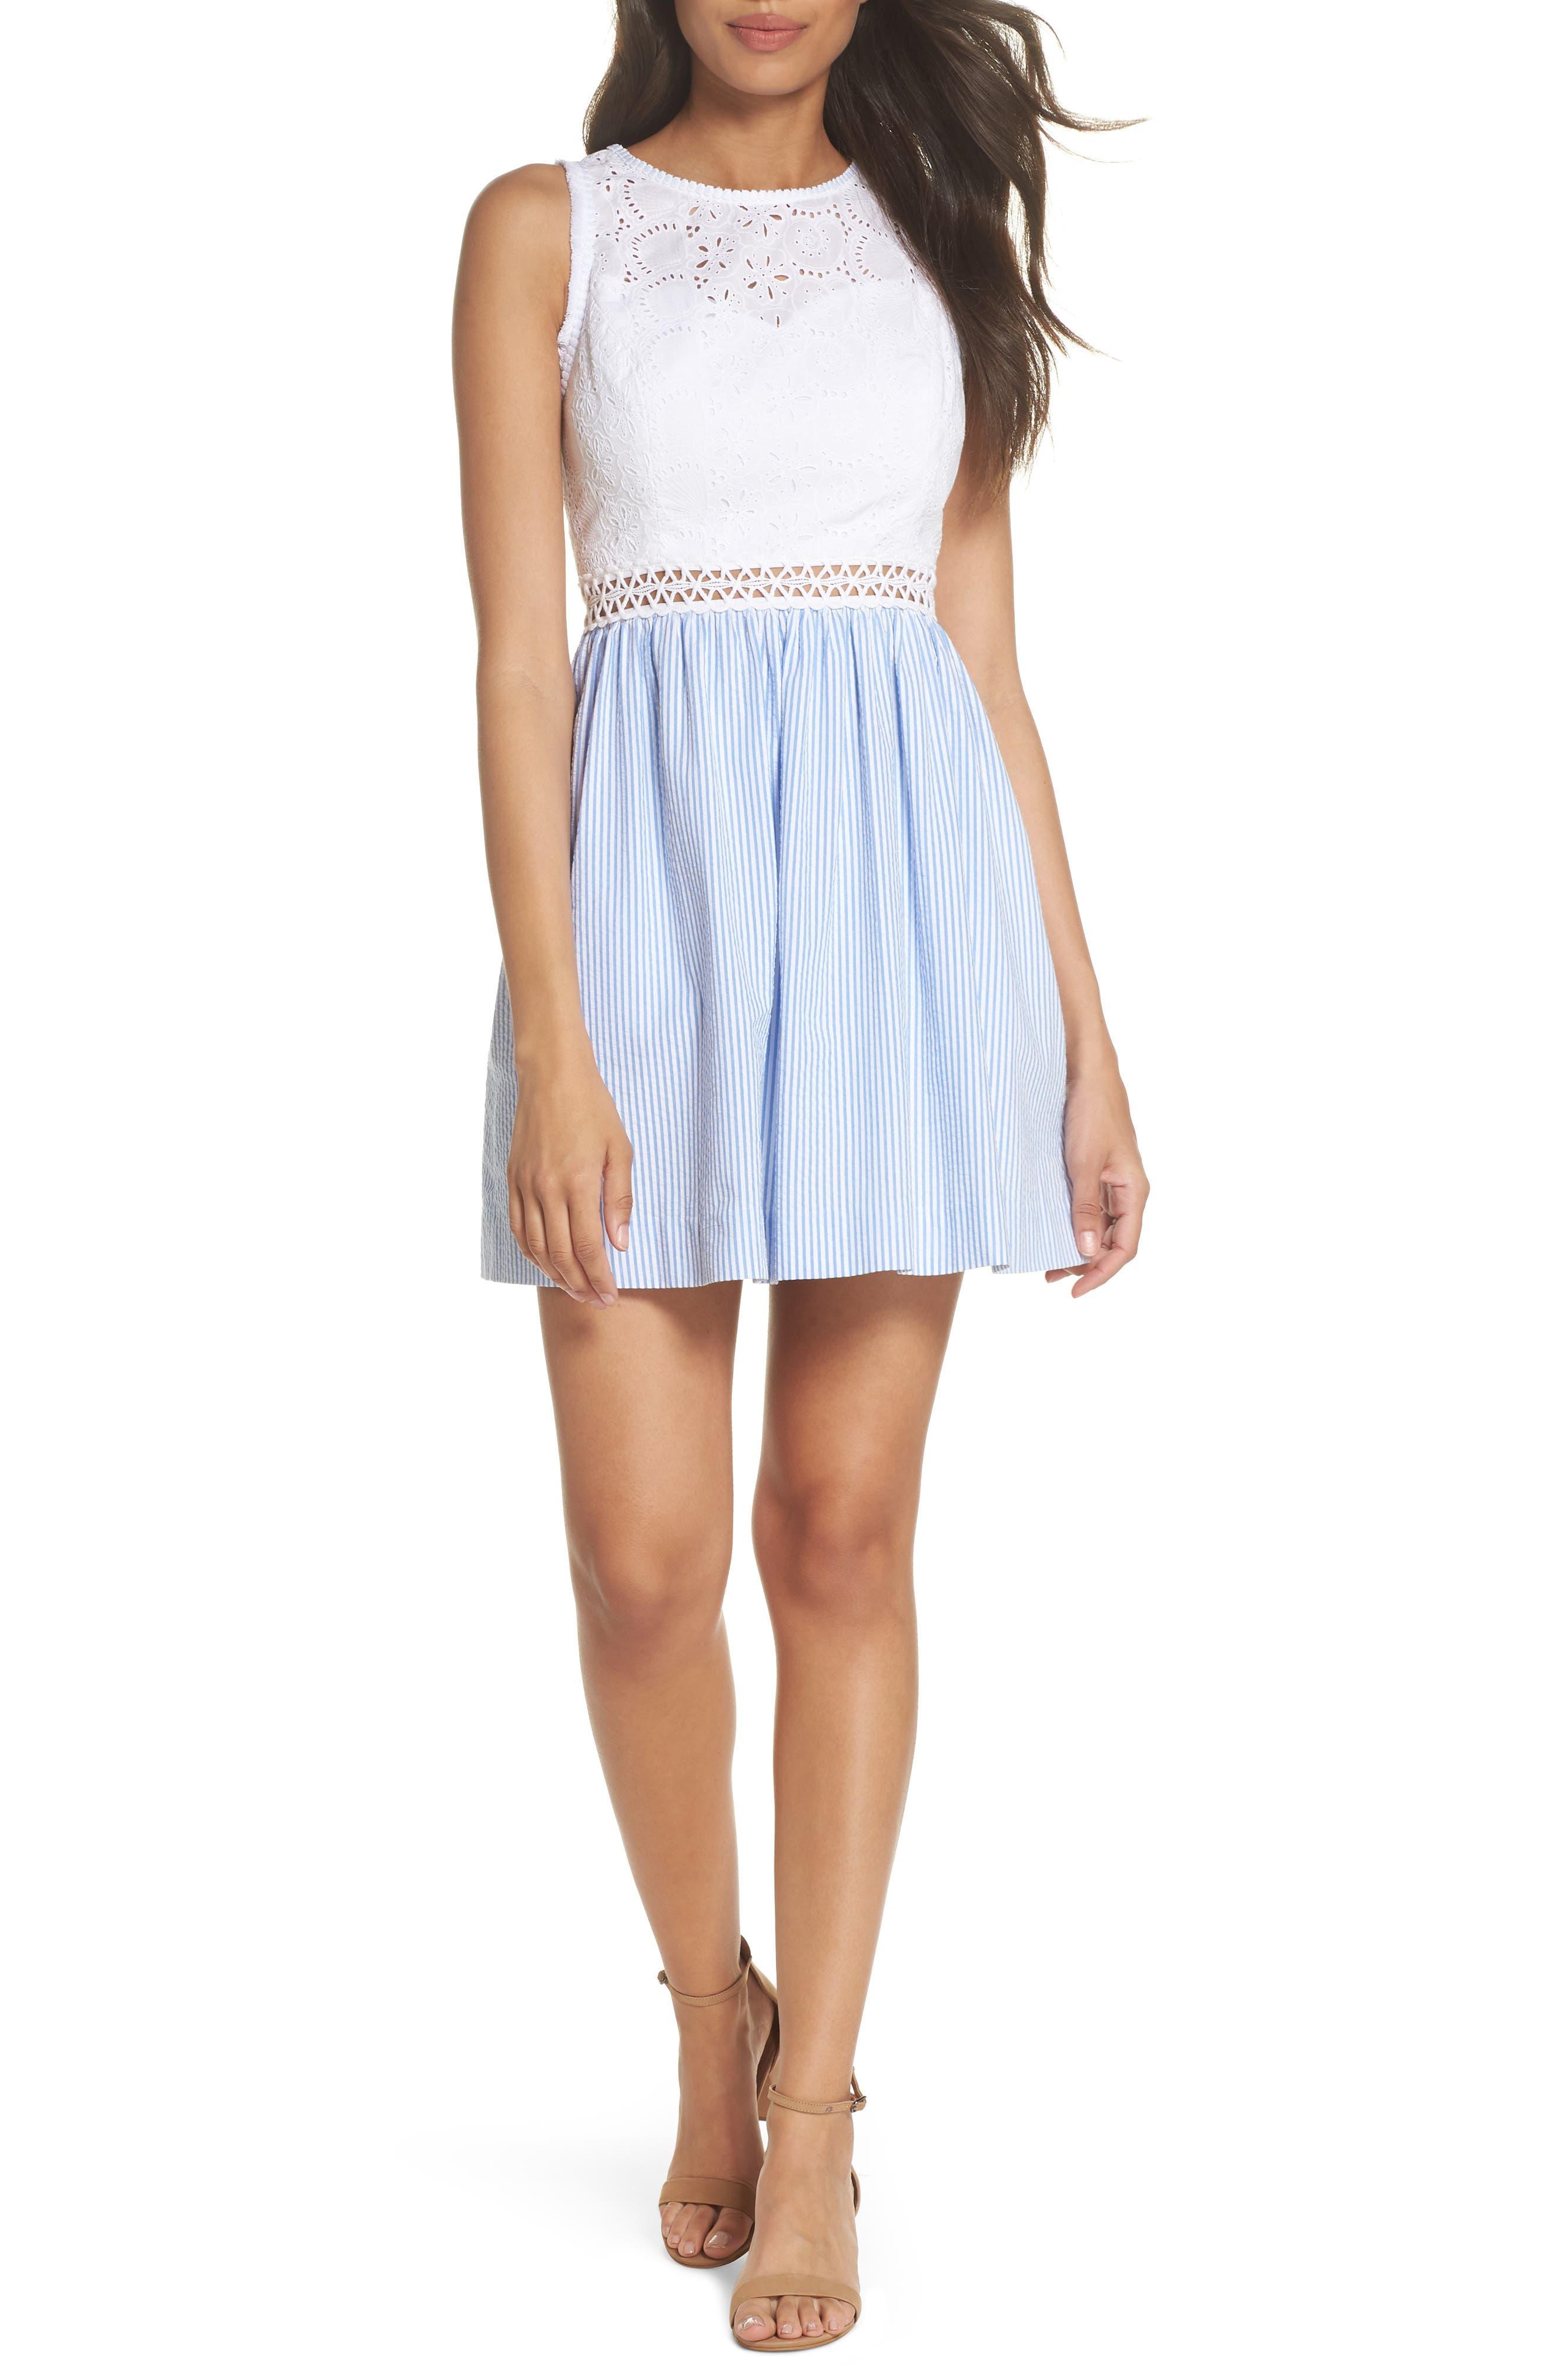 Lilly Pullitzer<sup>®</sup> Alivia Eyelet & Seersucker Fit & Flare Dress,                         Main,                         color, Bennet Blue Yard Dyed Stripe